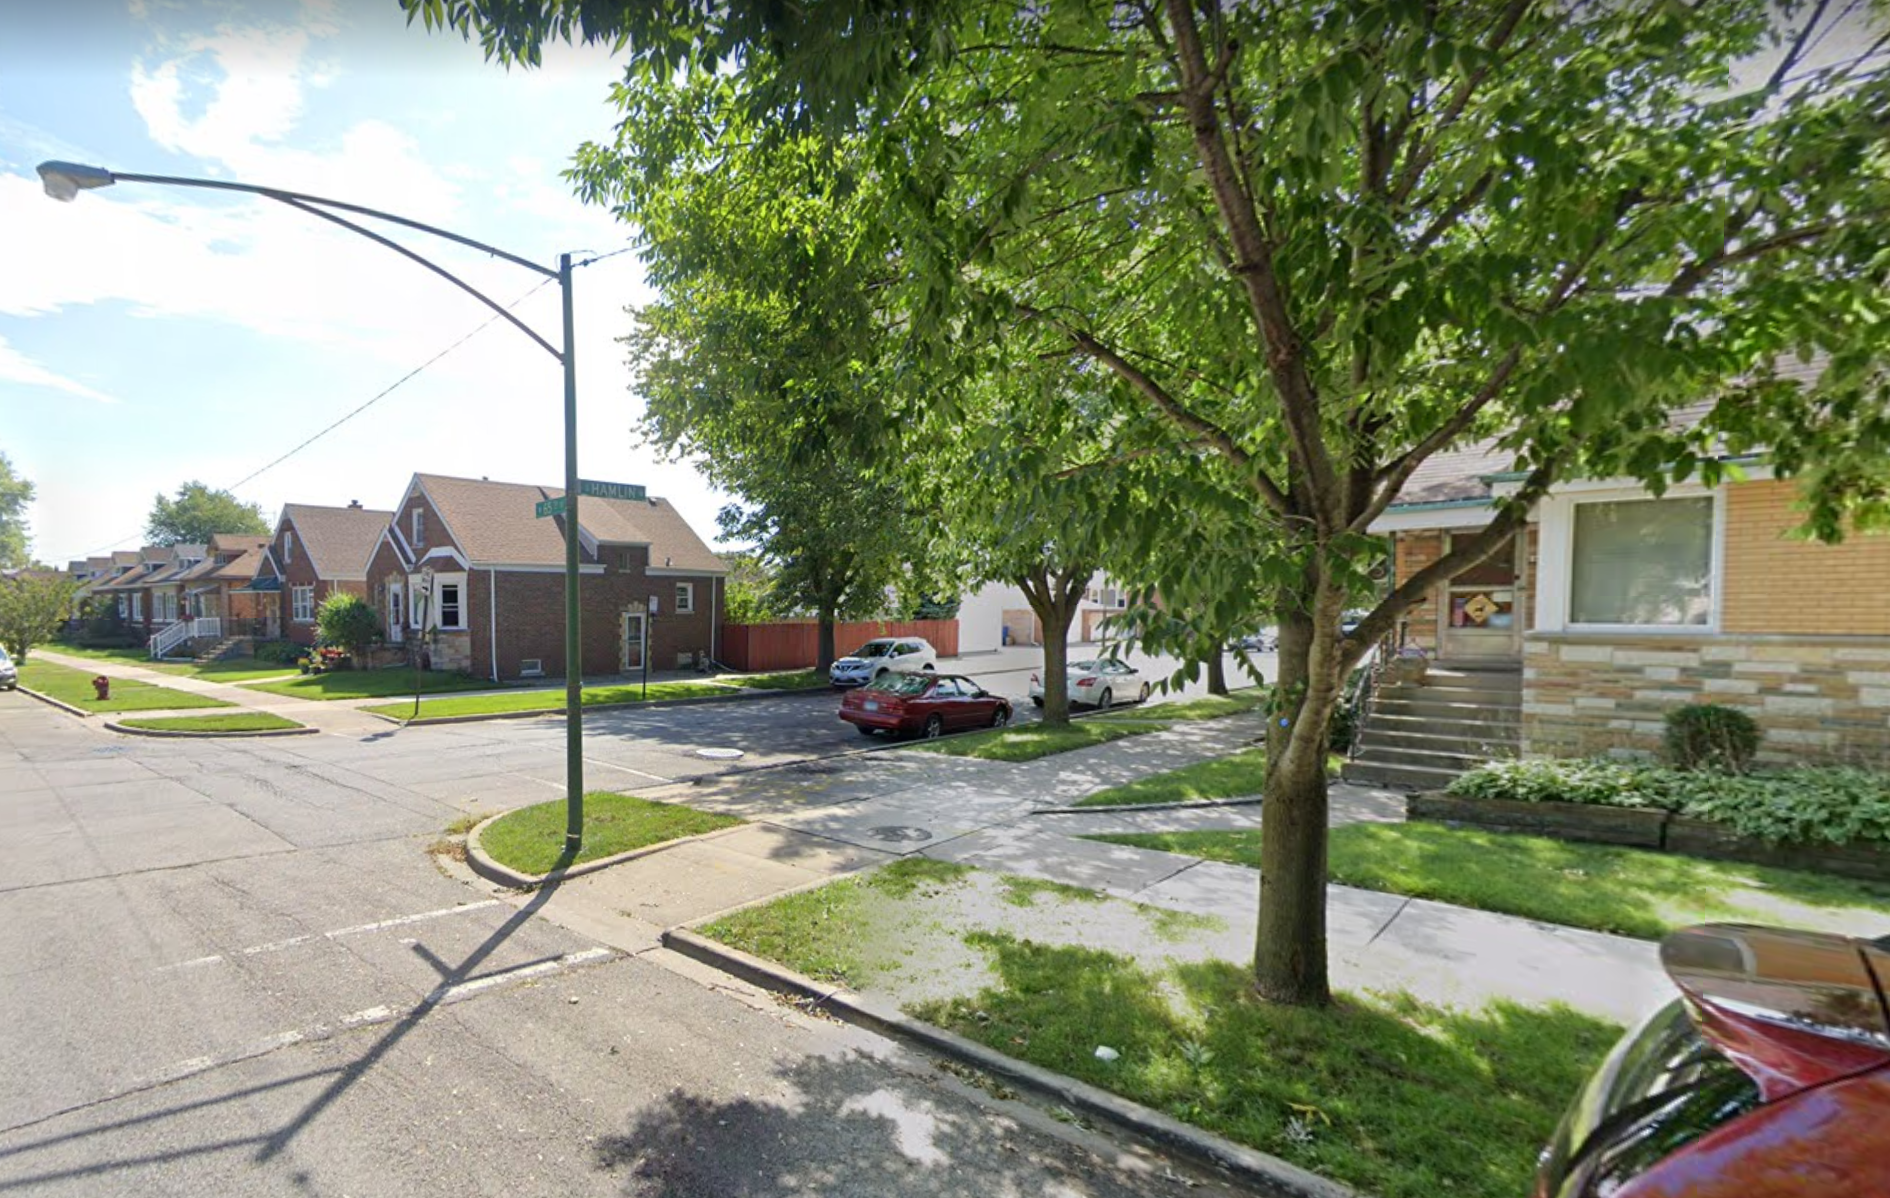 A teenage boy was shot Aug. 21, 2020, in the 6500 block of South Hamlin Avenue.